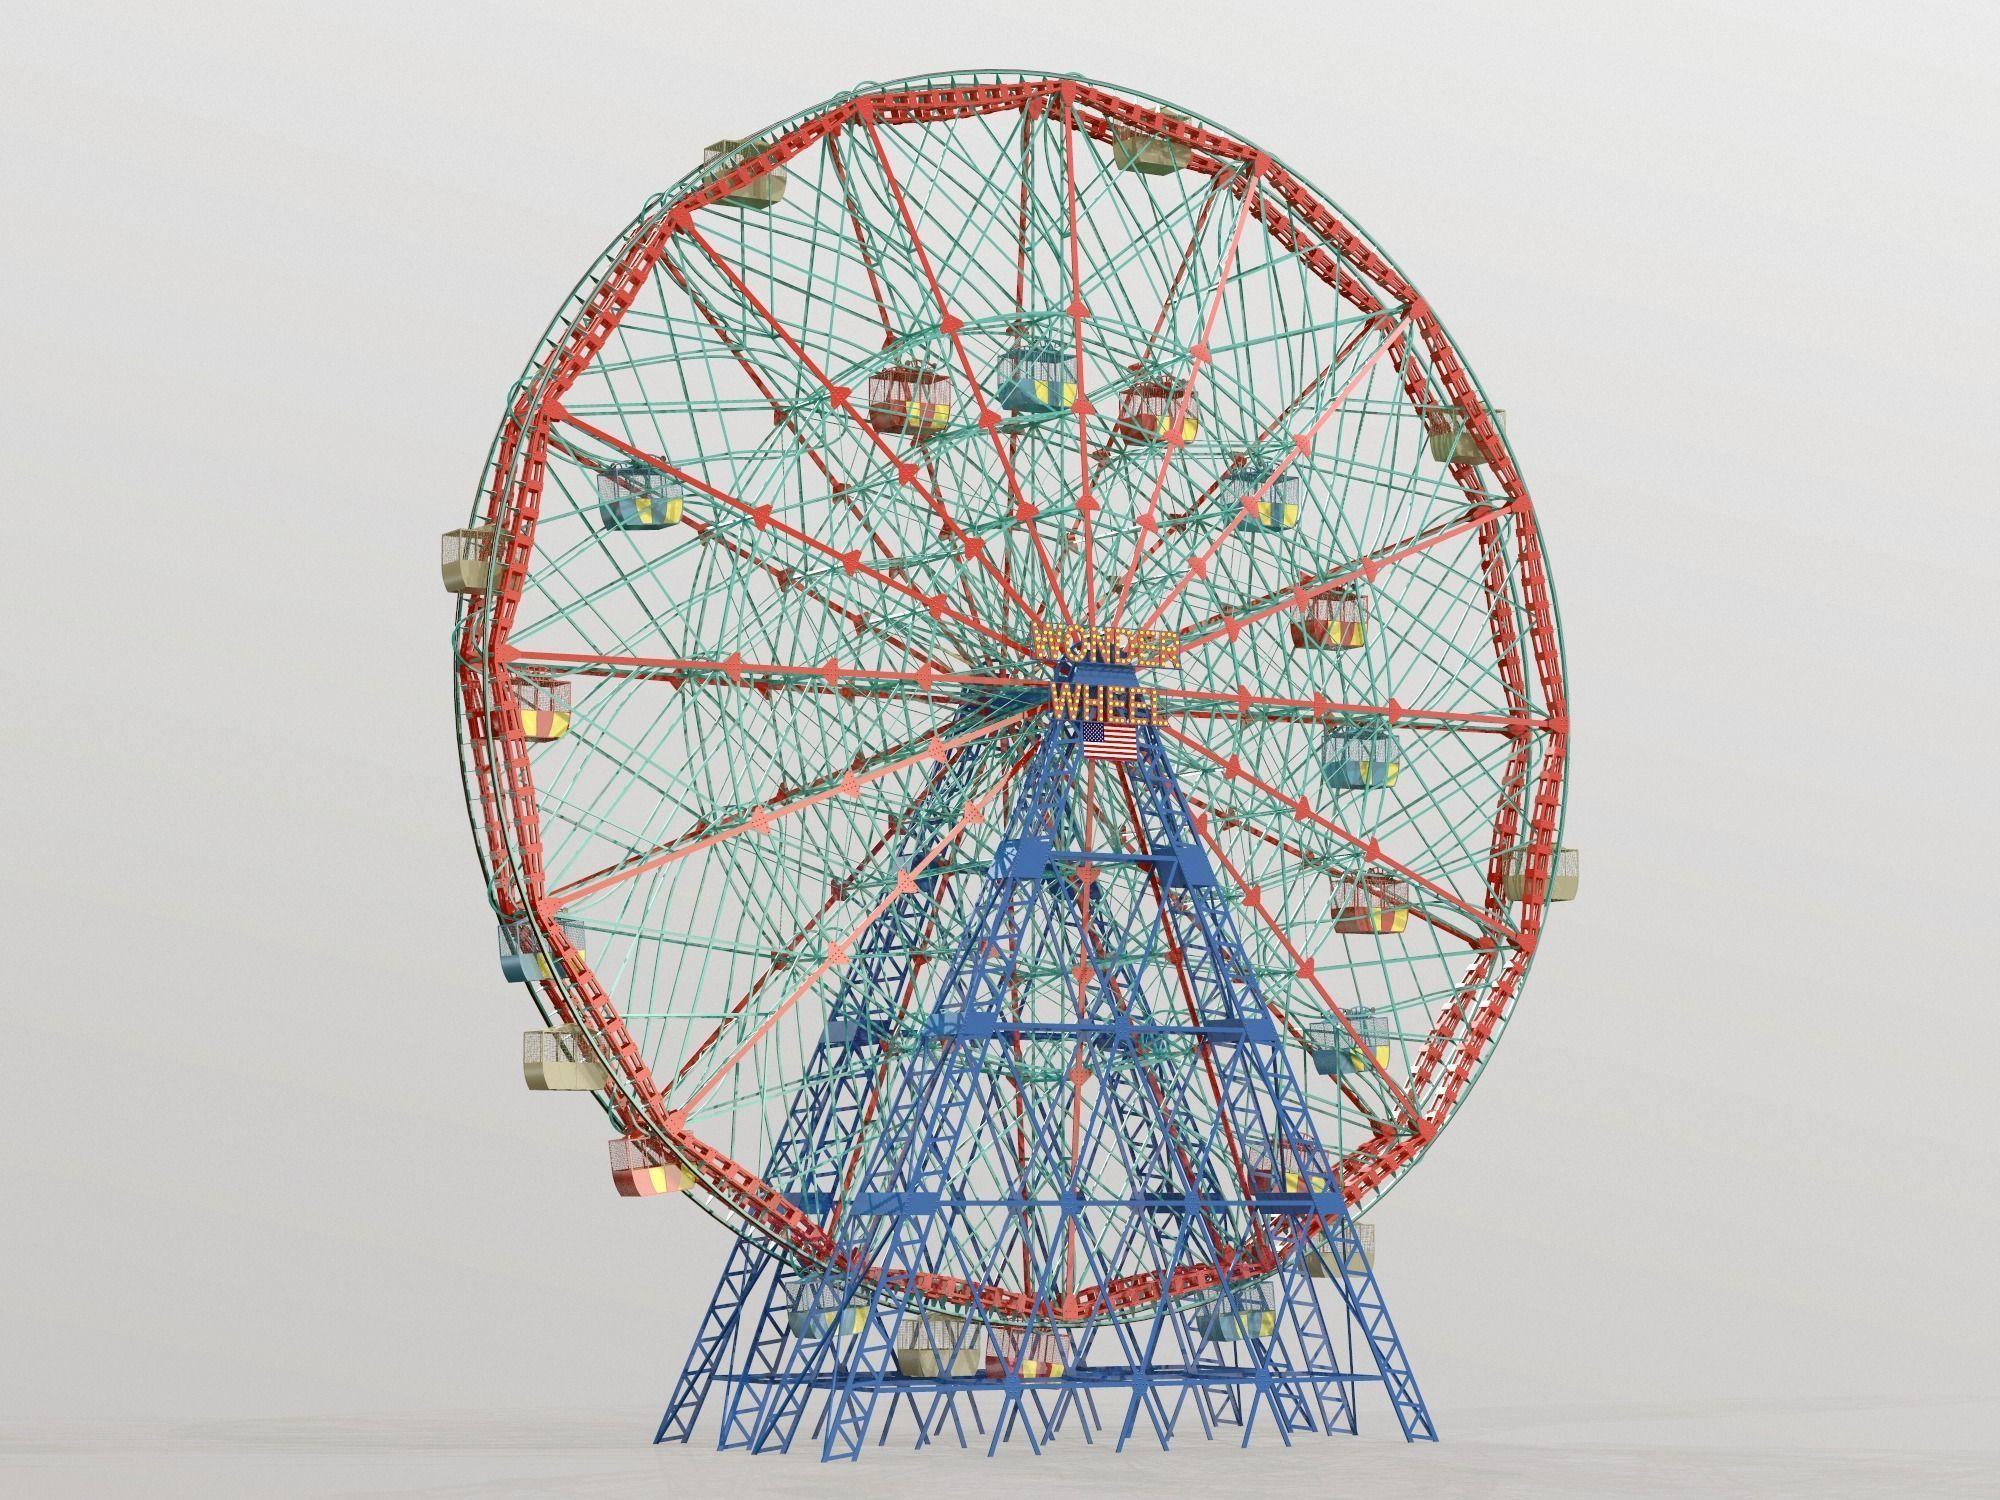 Denos Wonder Wheel Coney Island Carousel